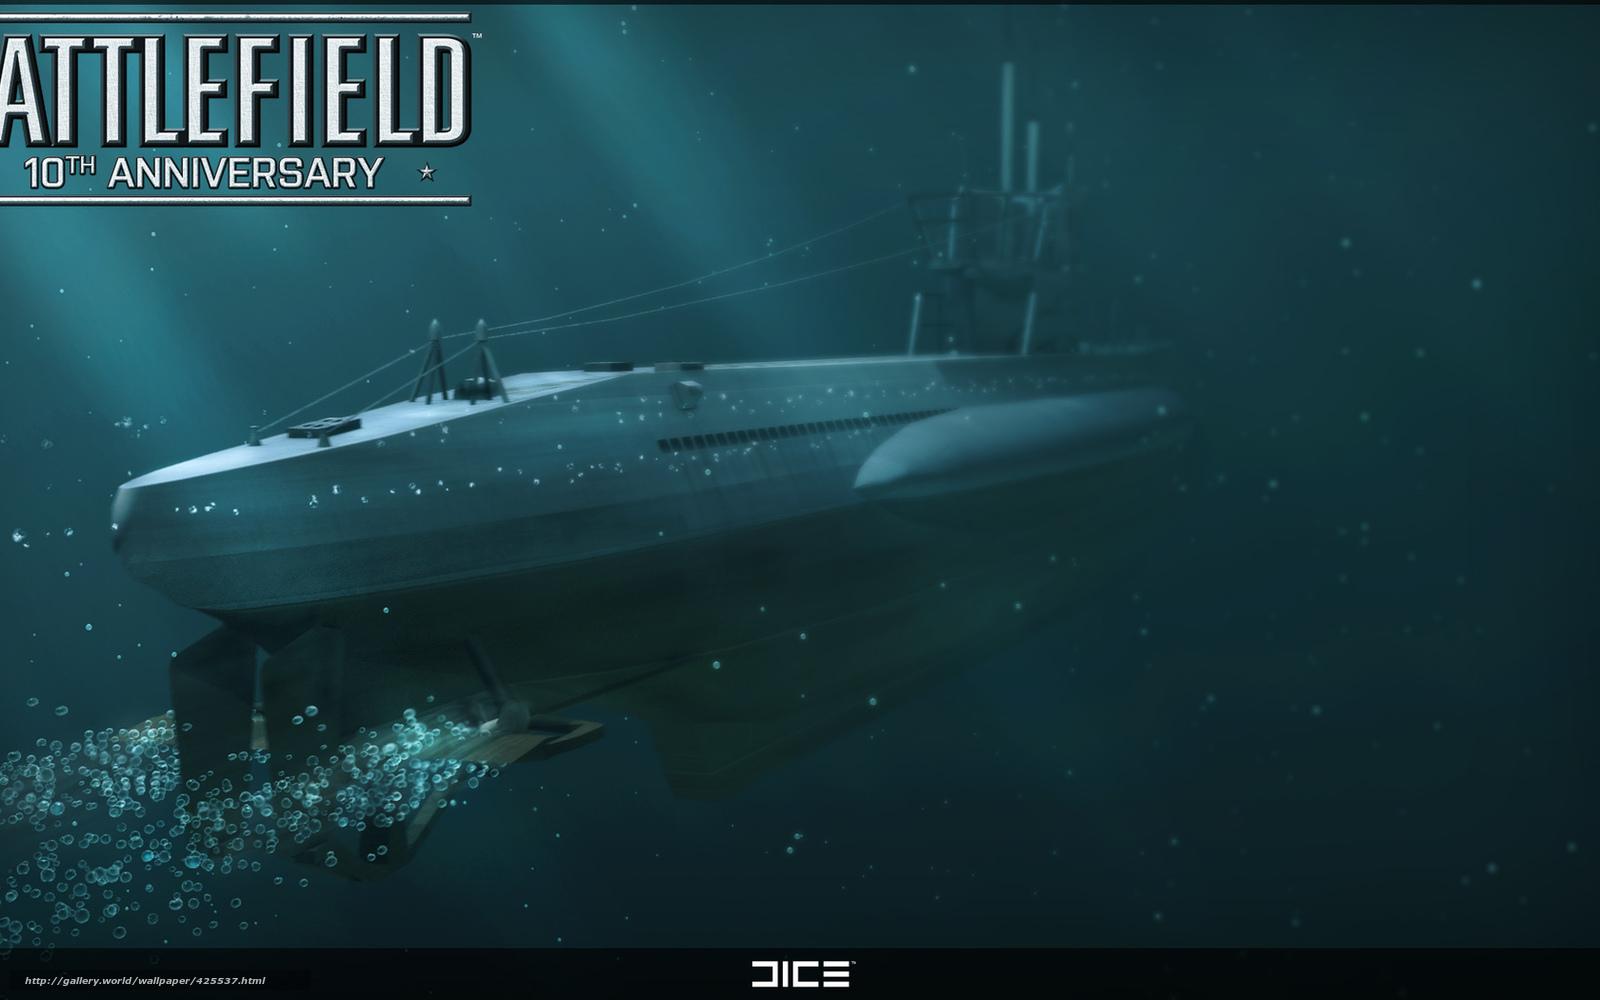 Download wallpaper submarine desktop wallpaper in the resolution 1600x1000